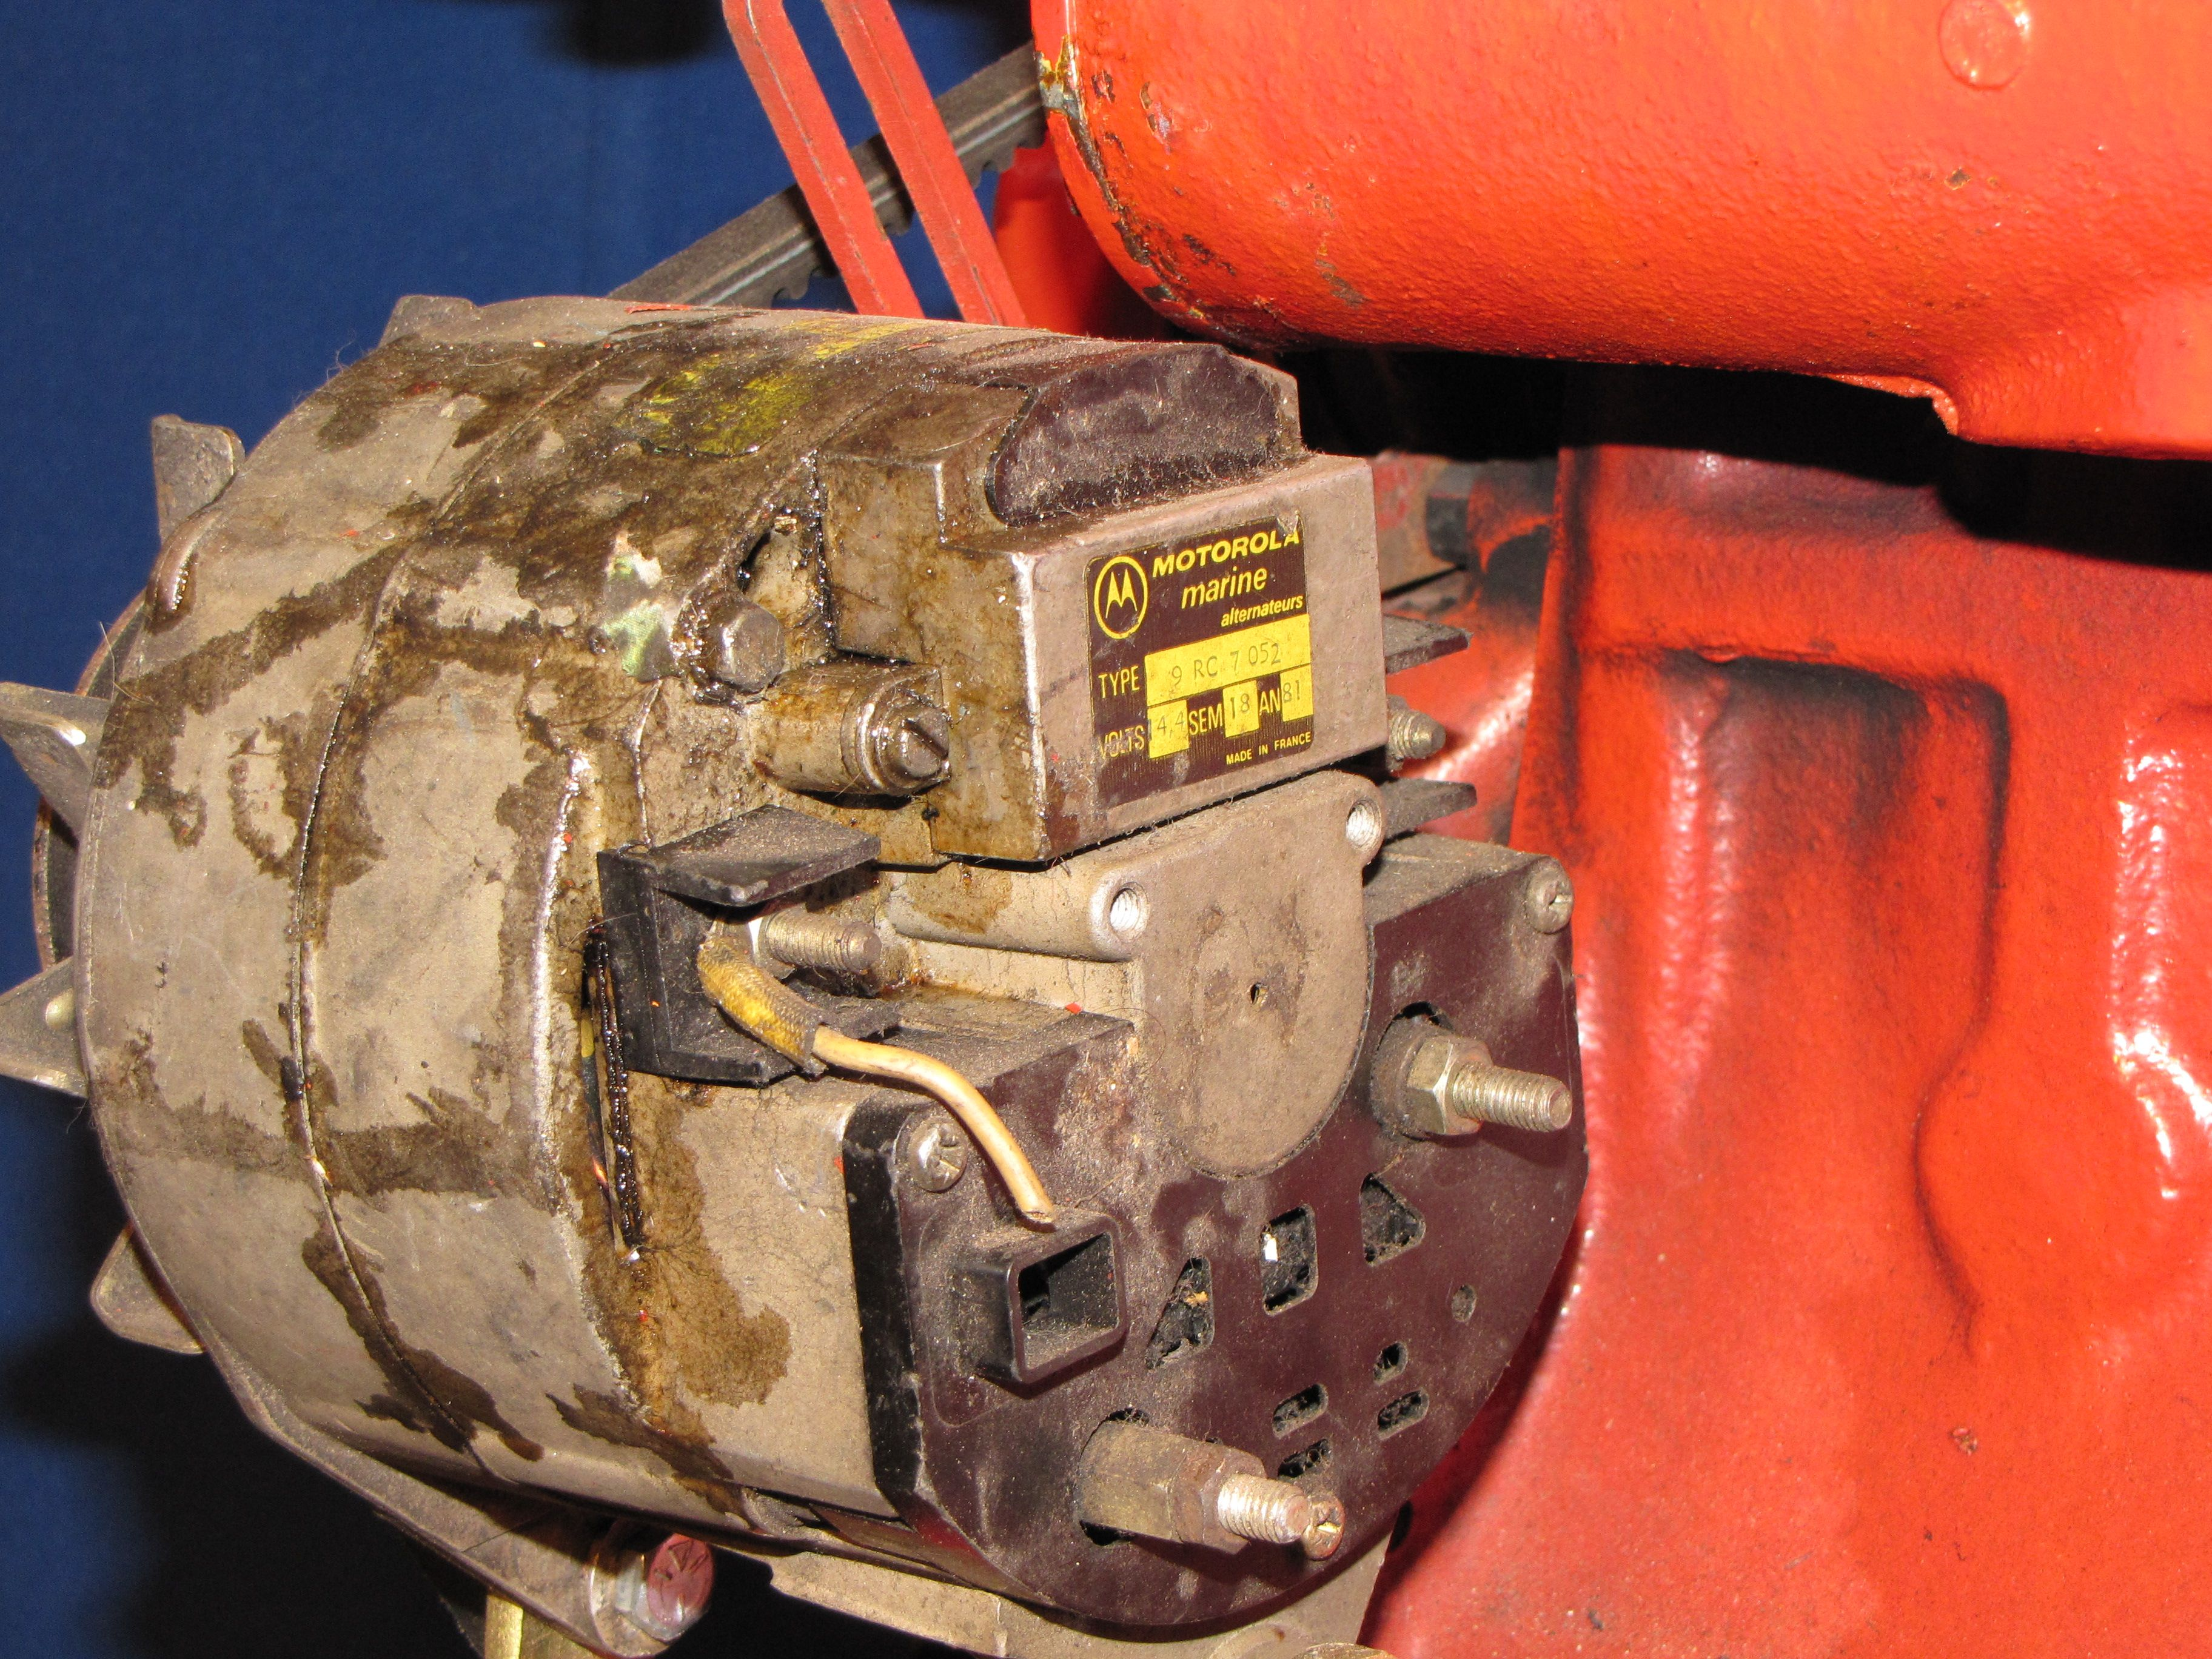 Lehman alternator amp fitted to all sp super power series lehman diesels wiring varies based on manufacturer french motorola shown